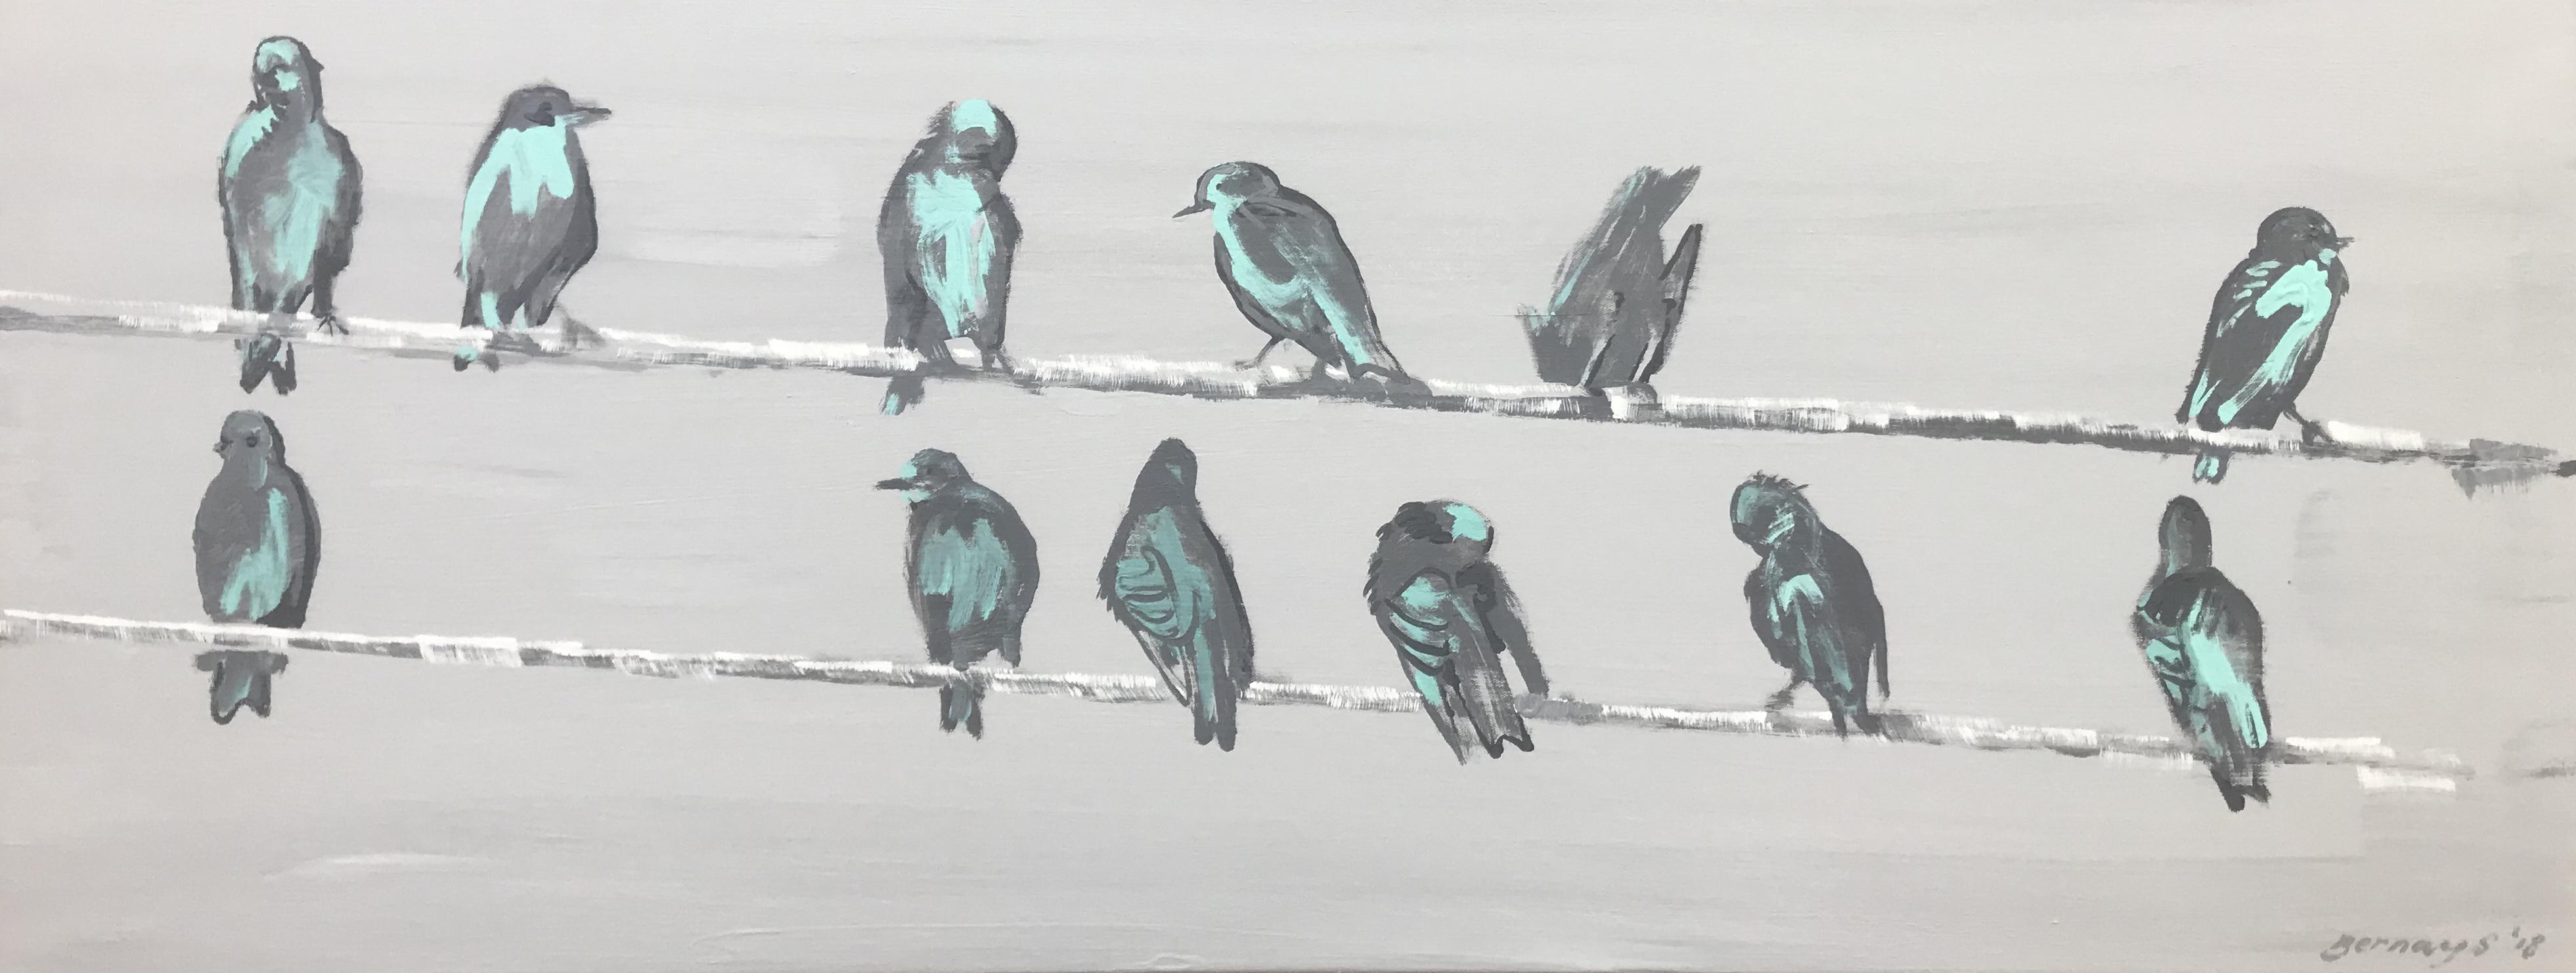 birdsong 30 p 75x12 bernays .JPG